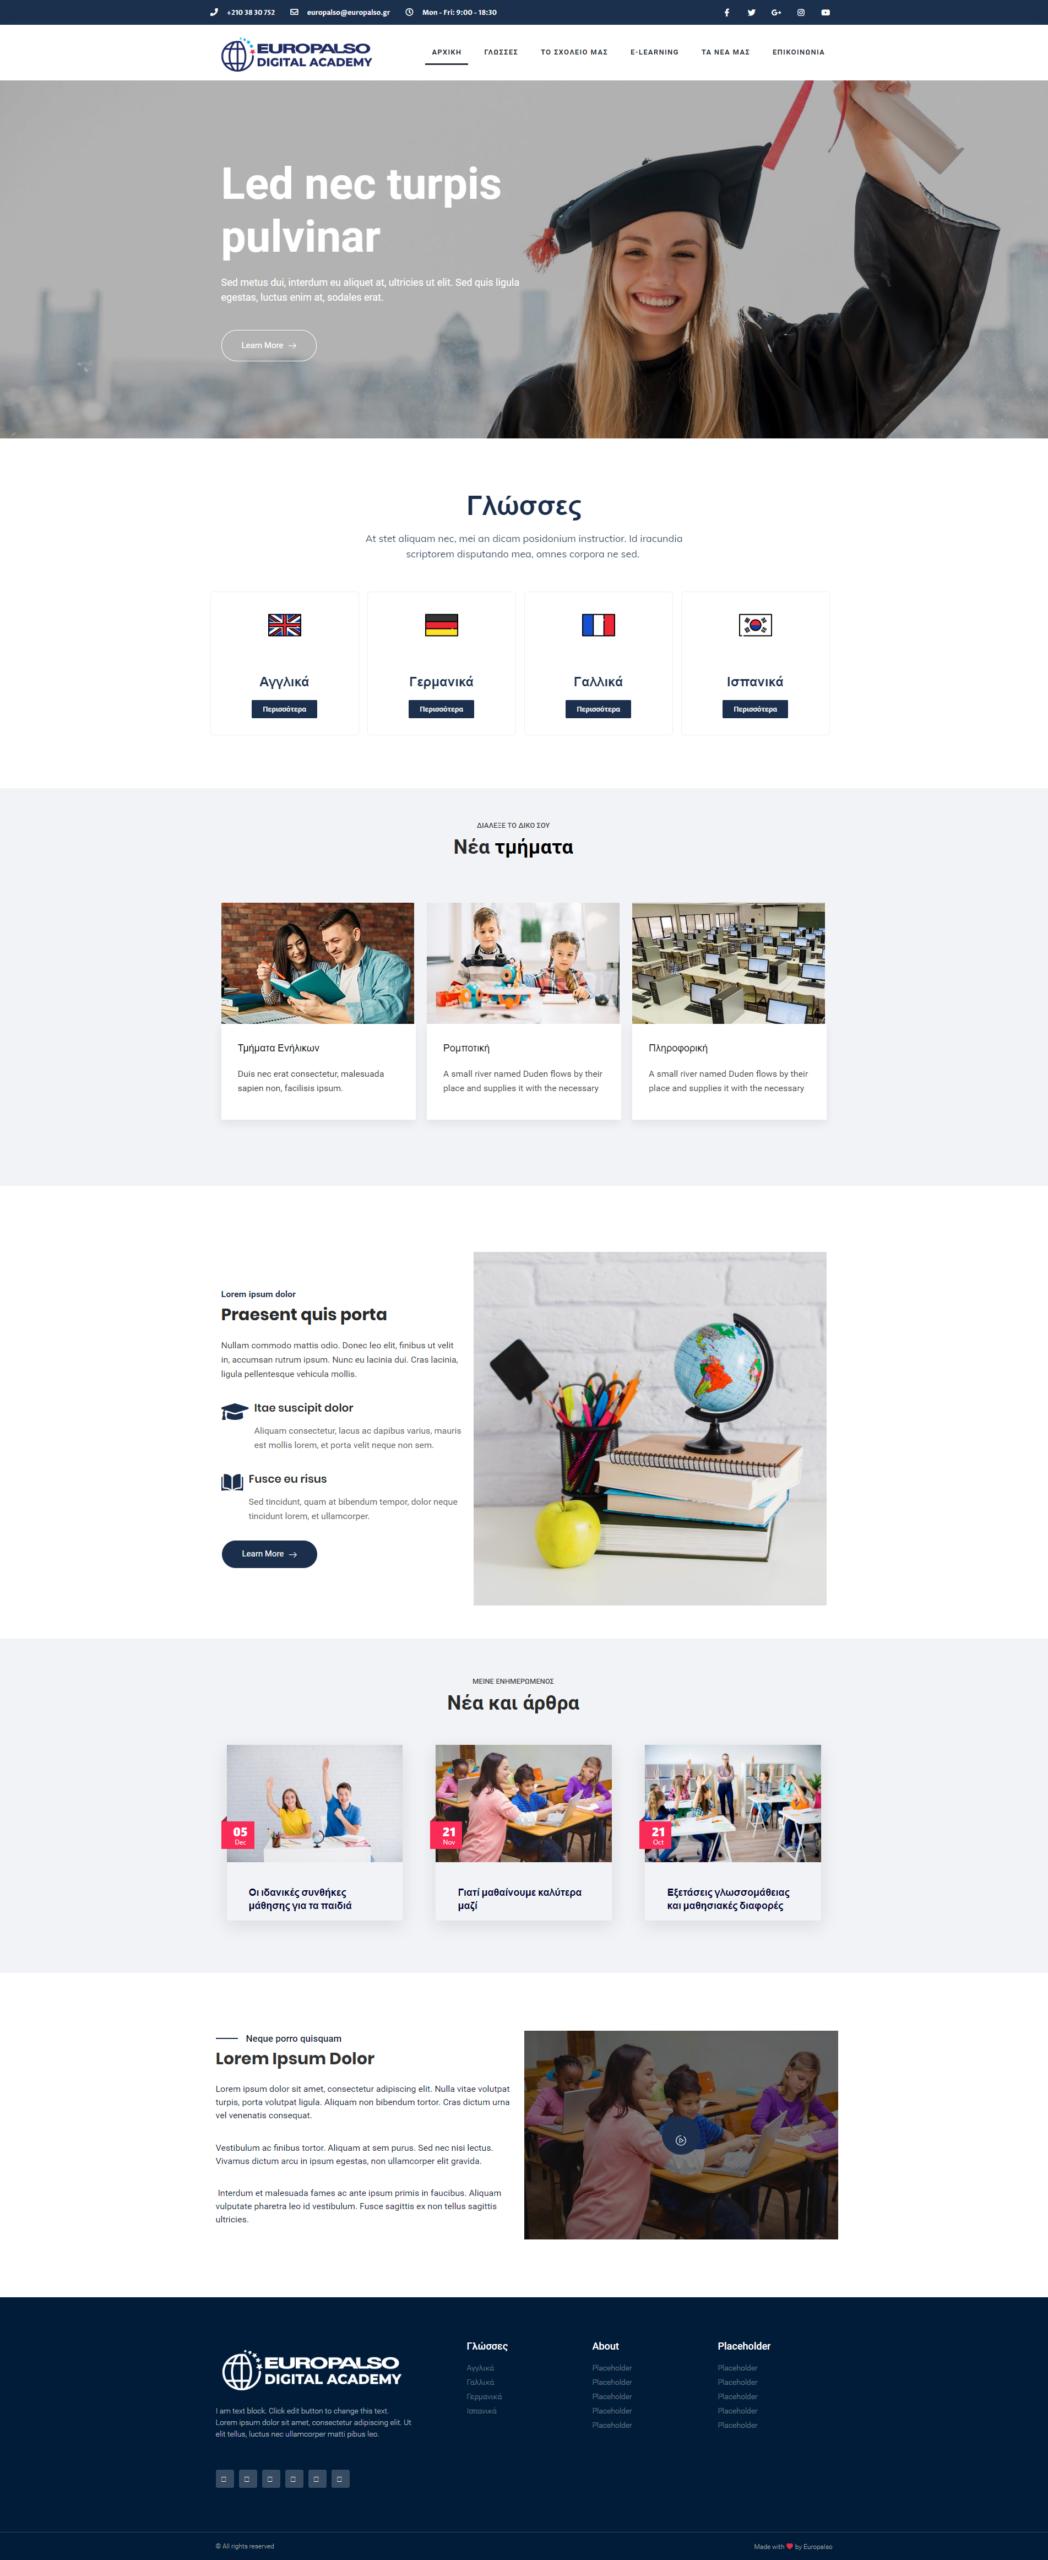 Europalso Digital Academy